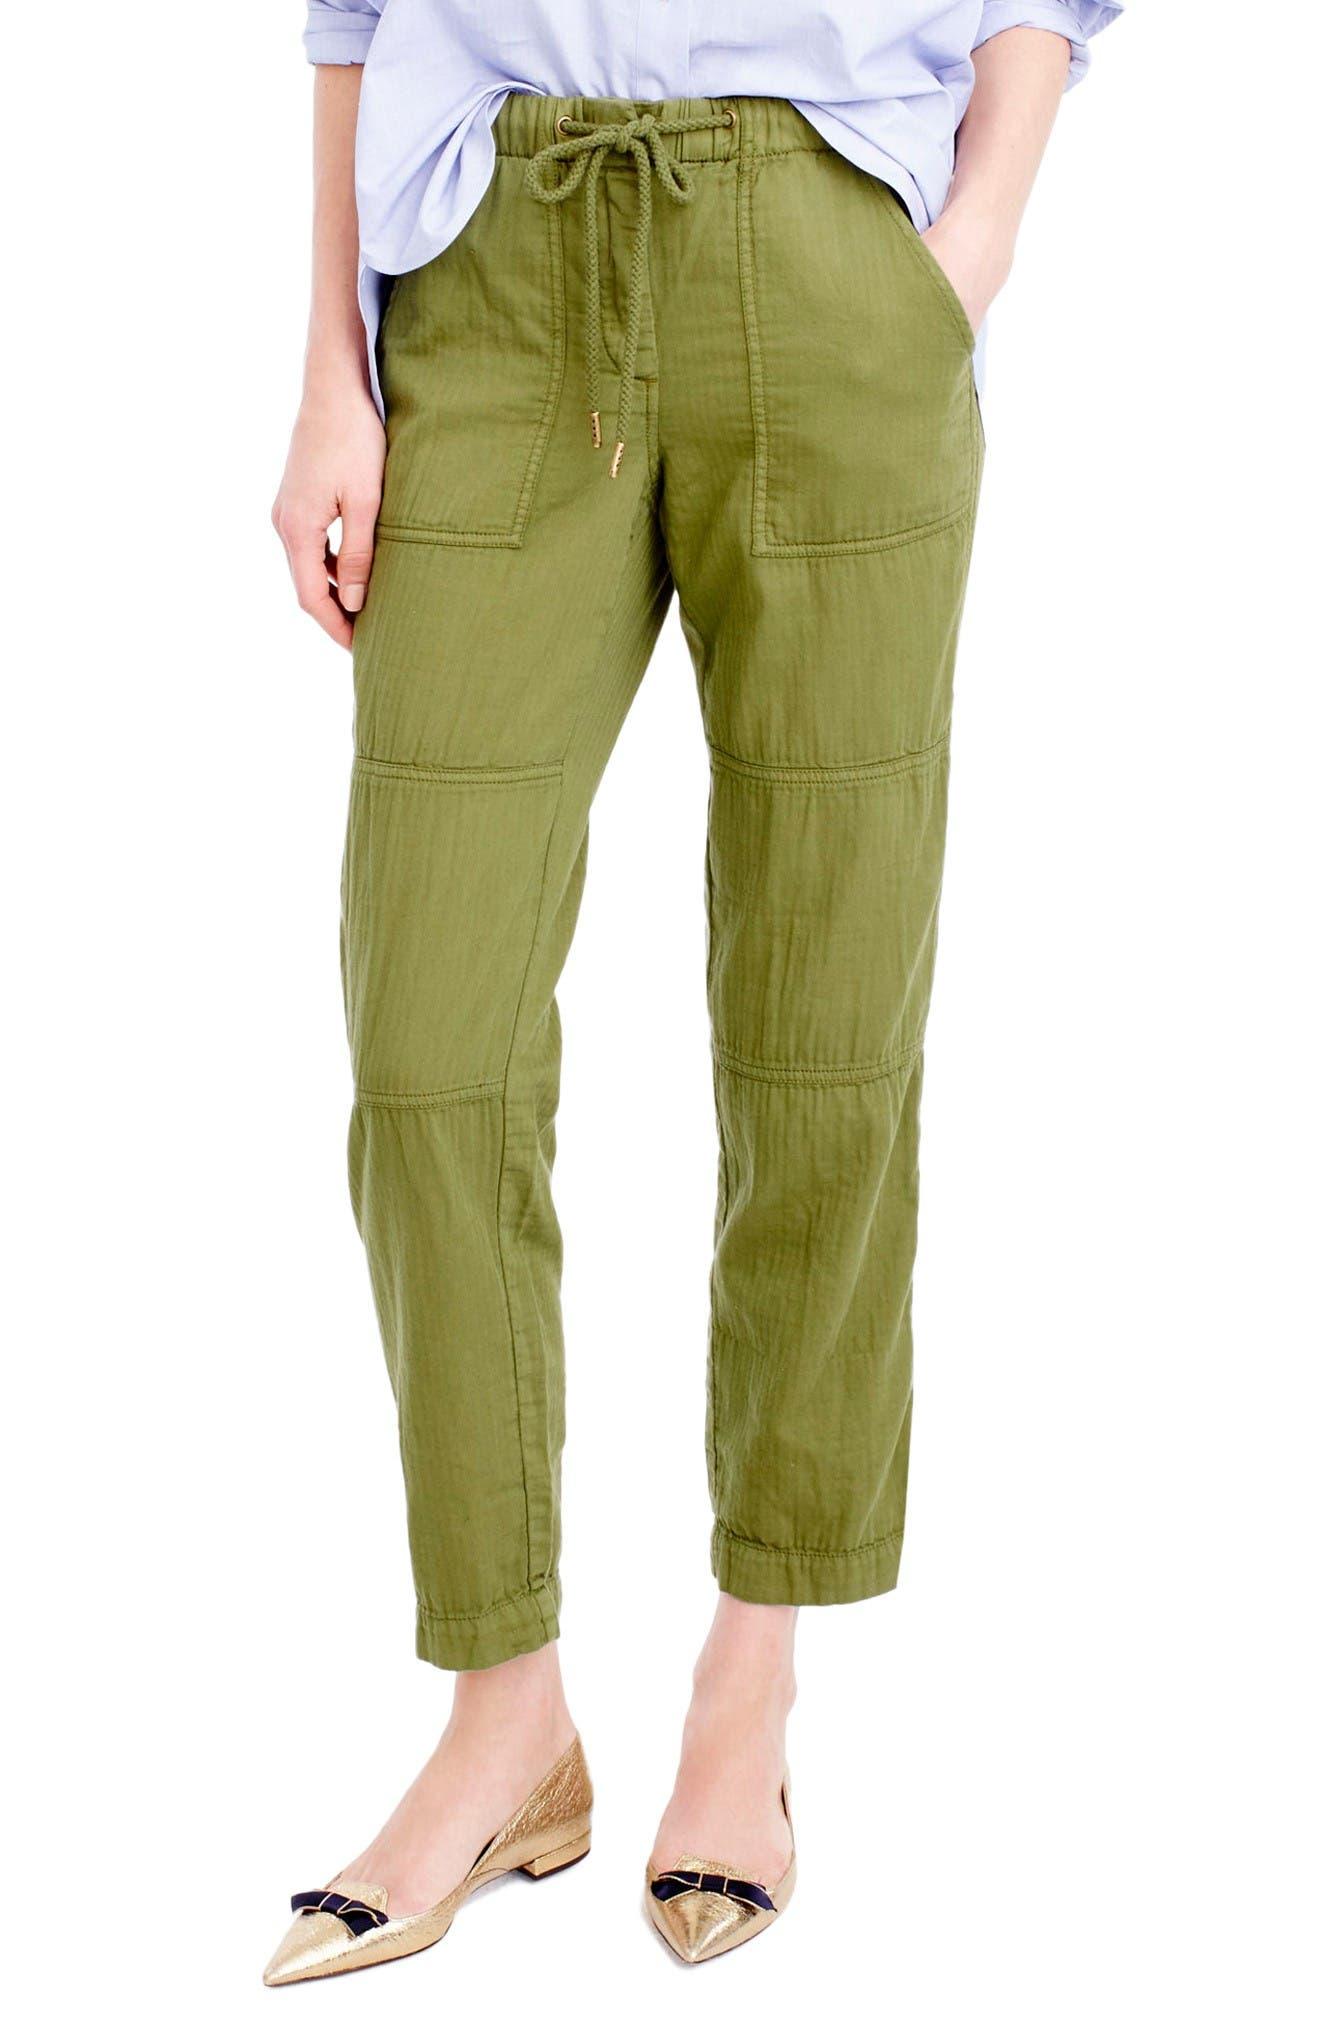 J.CREW Pull-On Cargo Pants